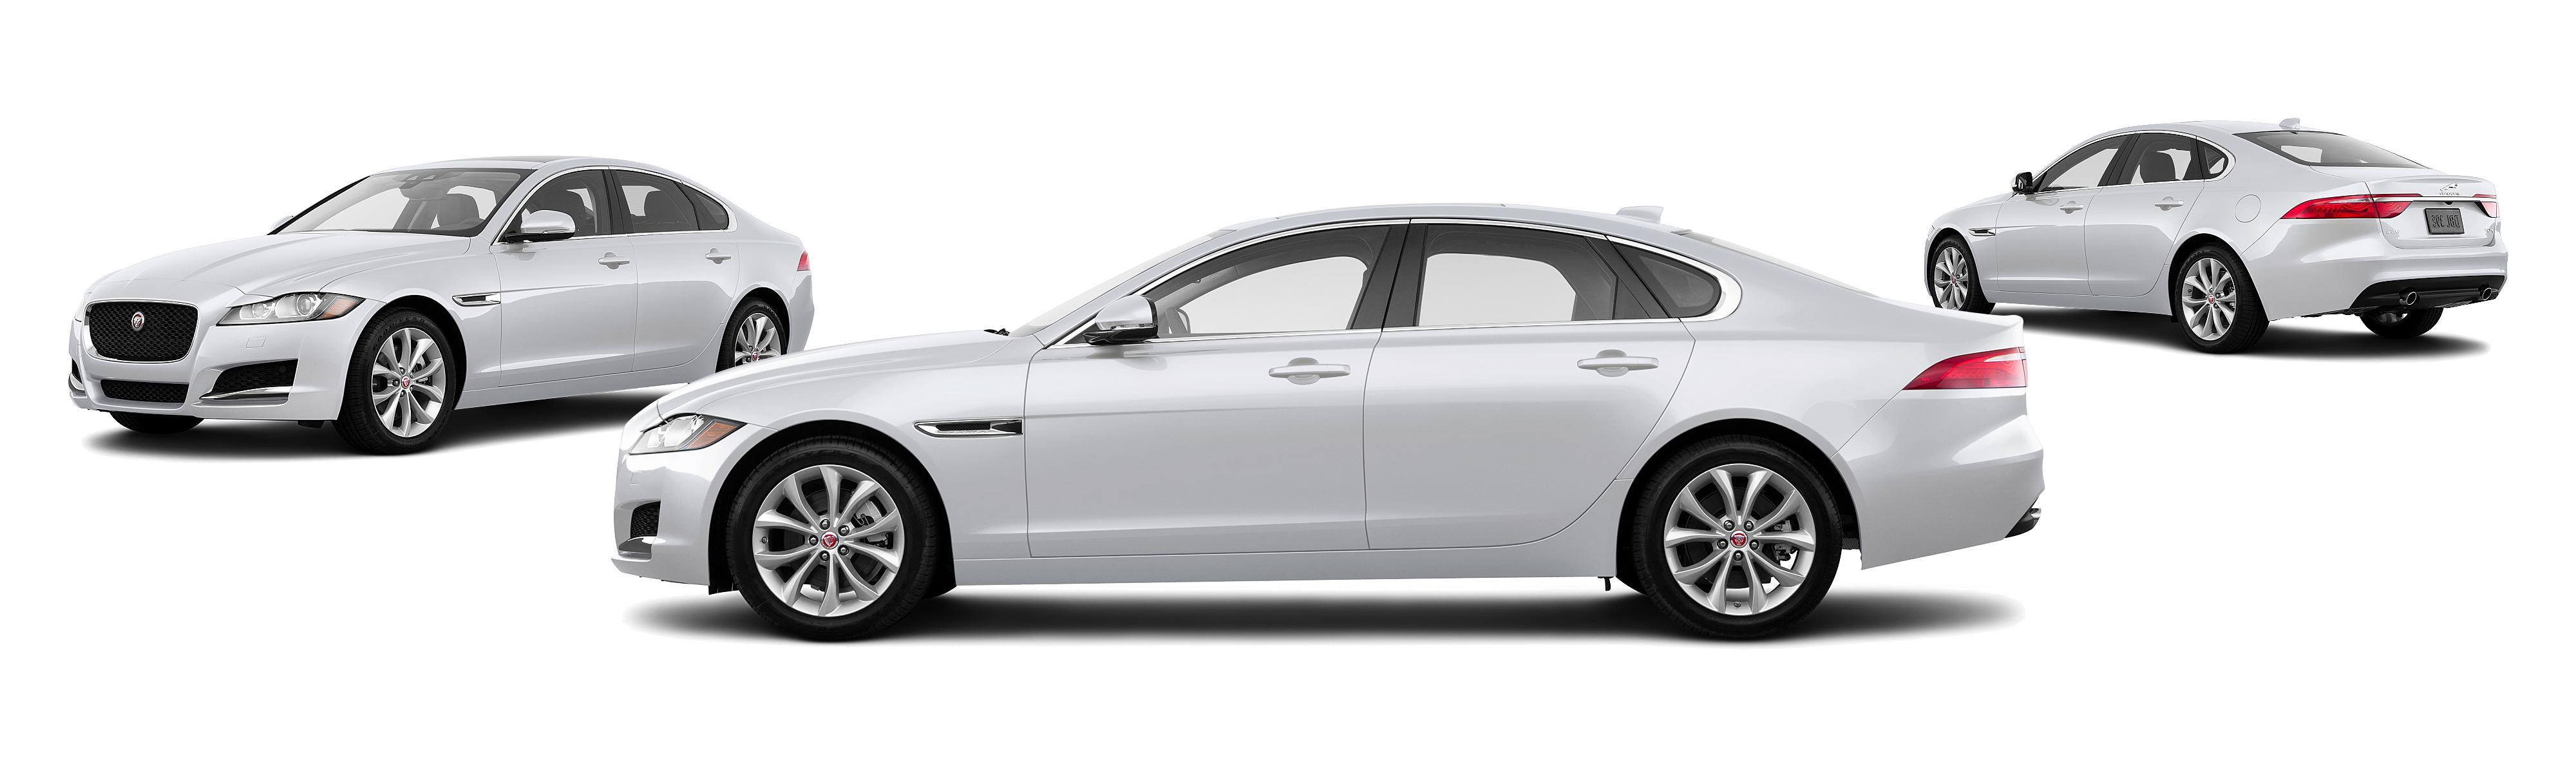 2018 Jaguar XF AWD S 4dr Sedan - Research - GrooveCar